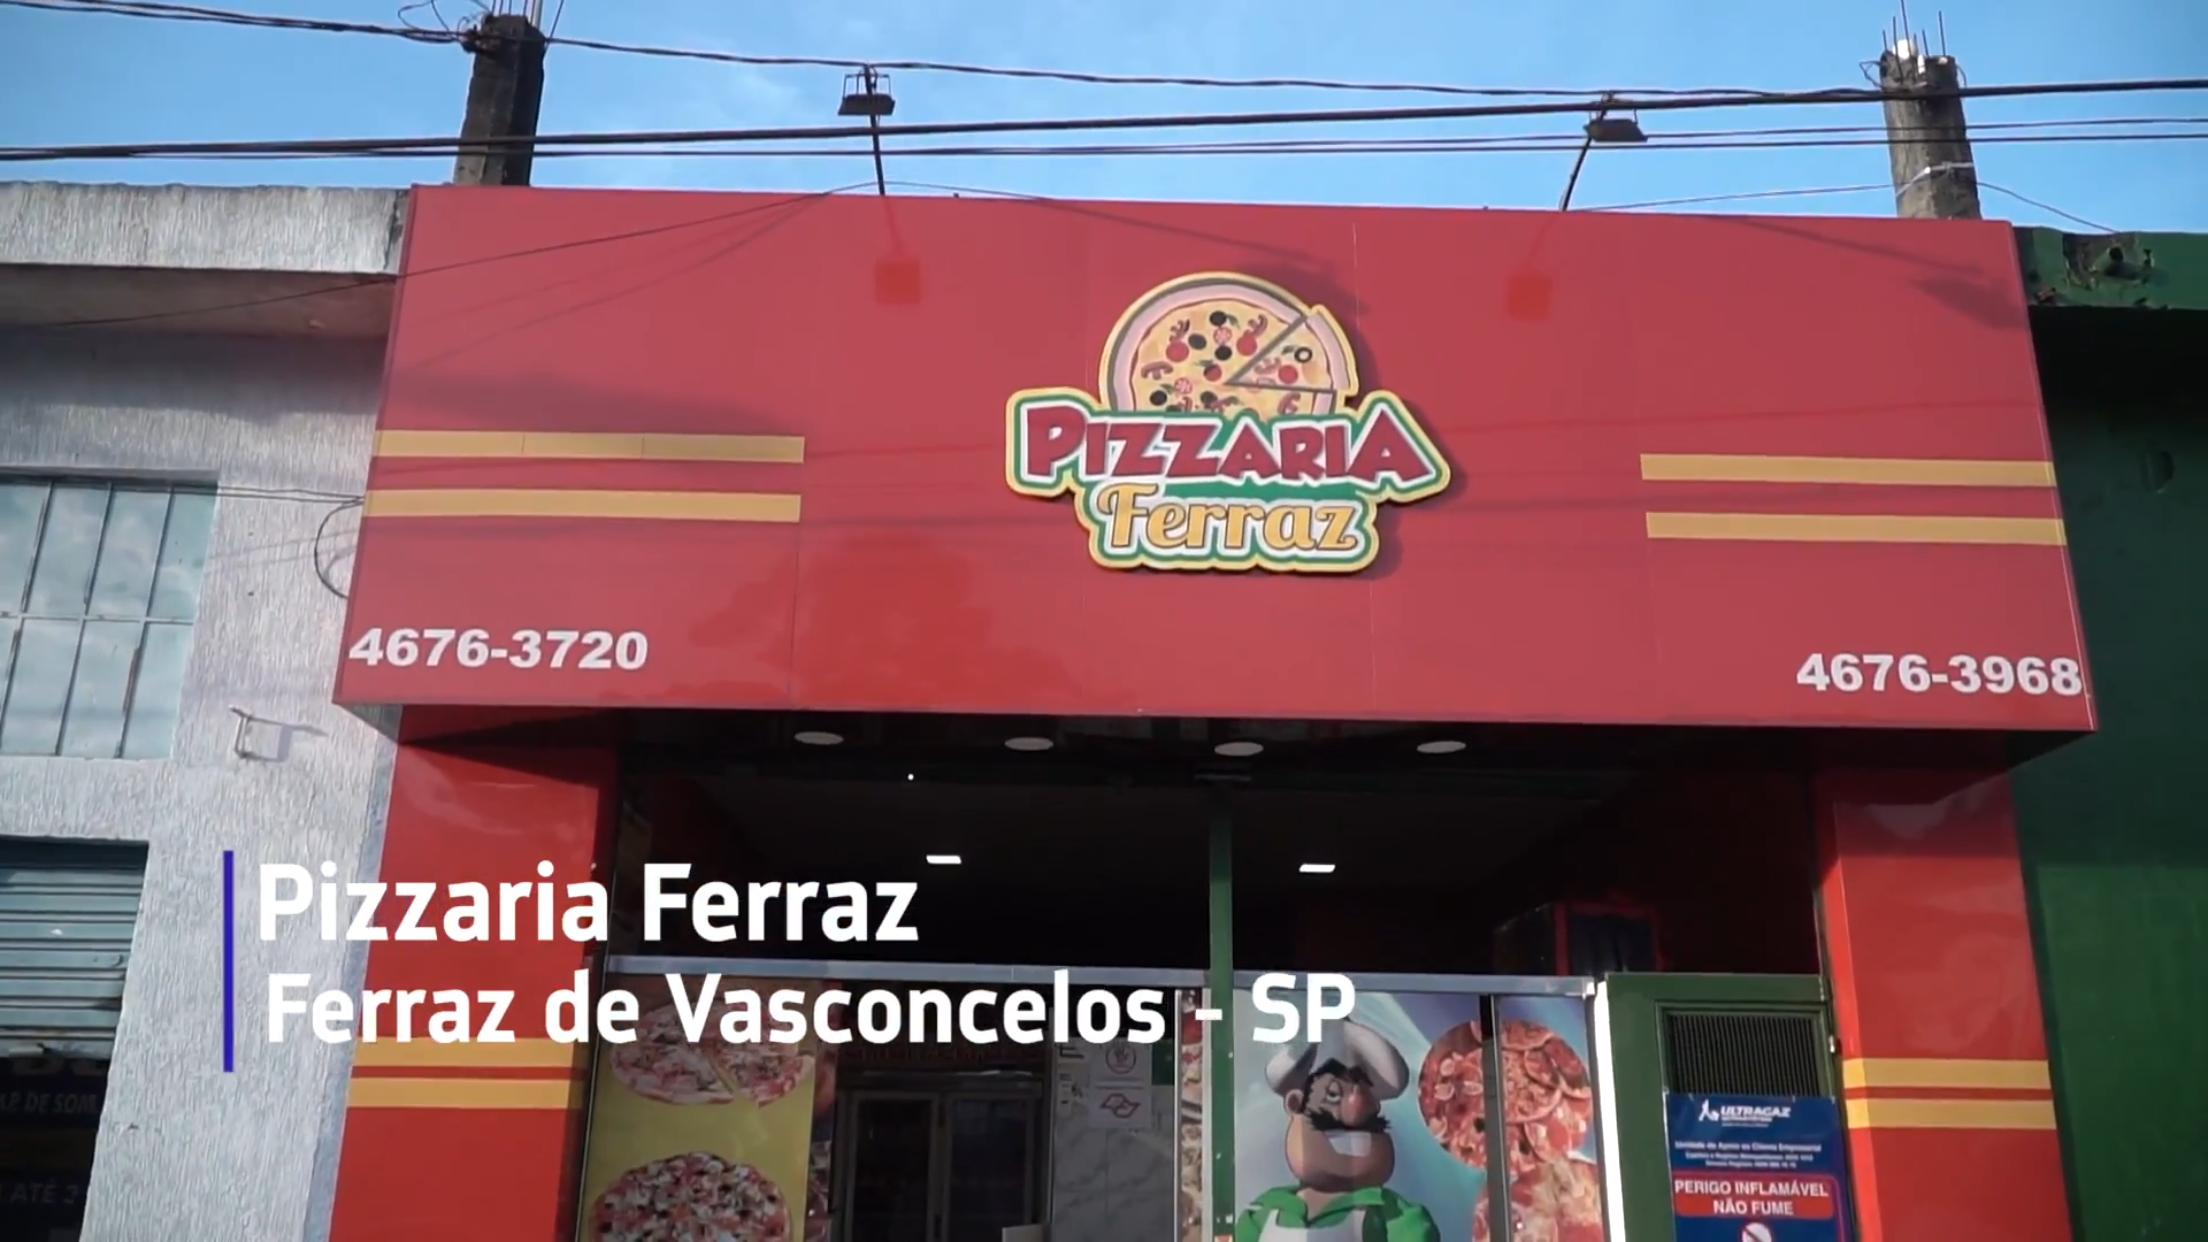 Pizzaria Ferraz